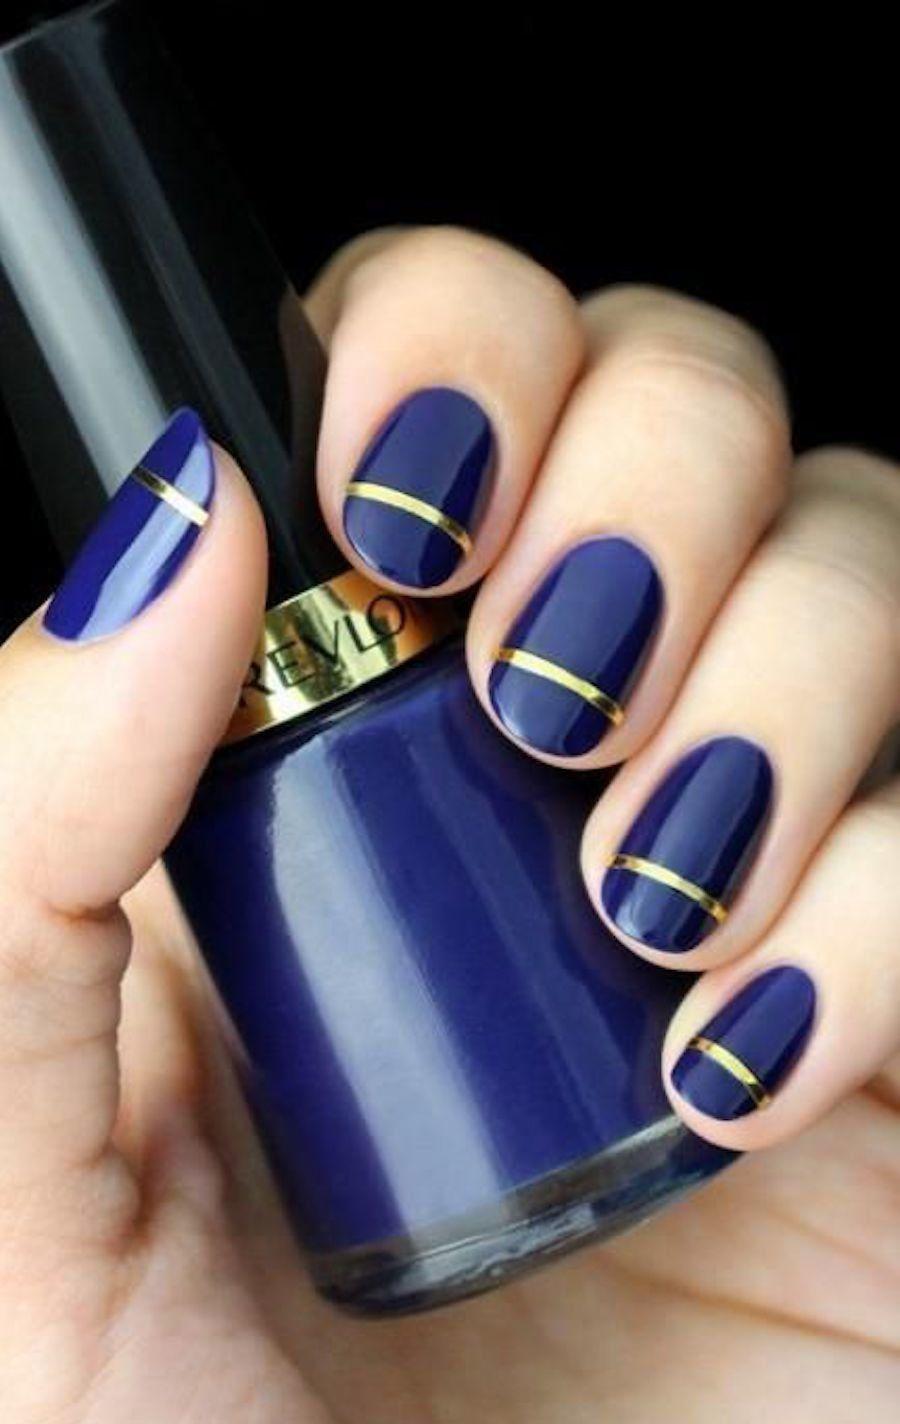 20 easy nail art ideas for short nails   Pinterest   Short nails ...